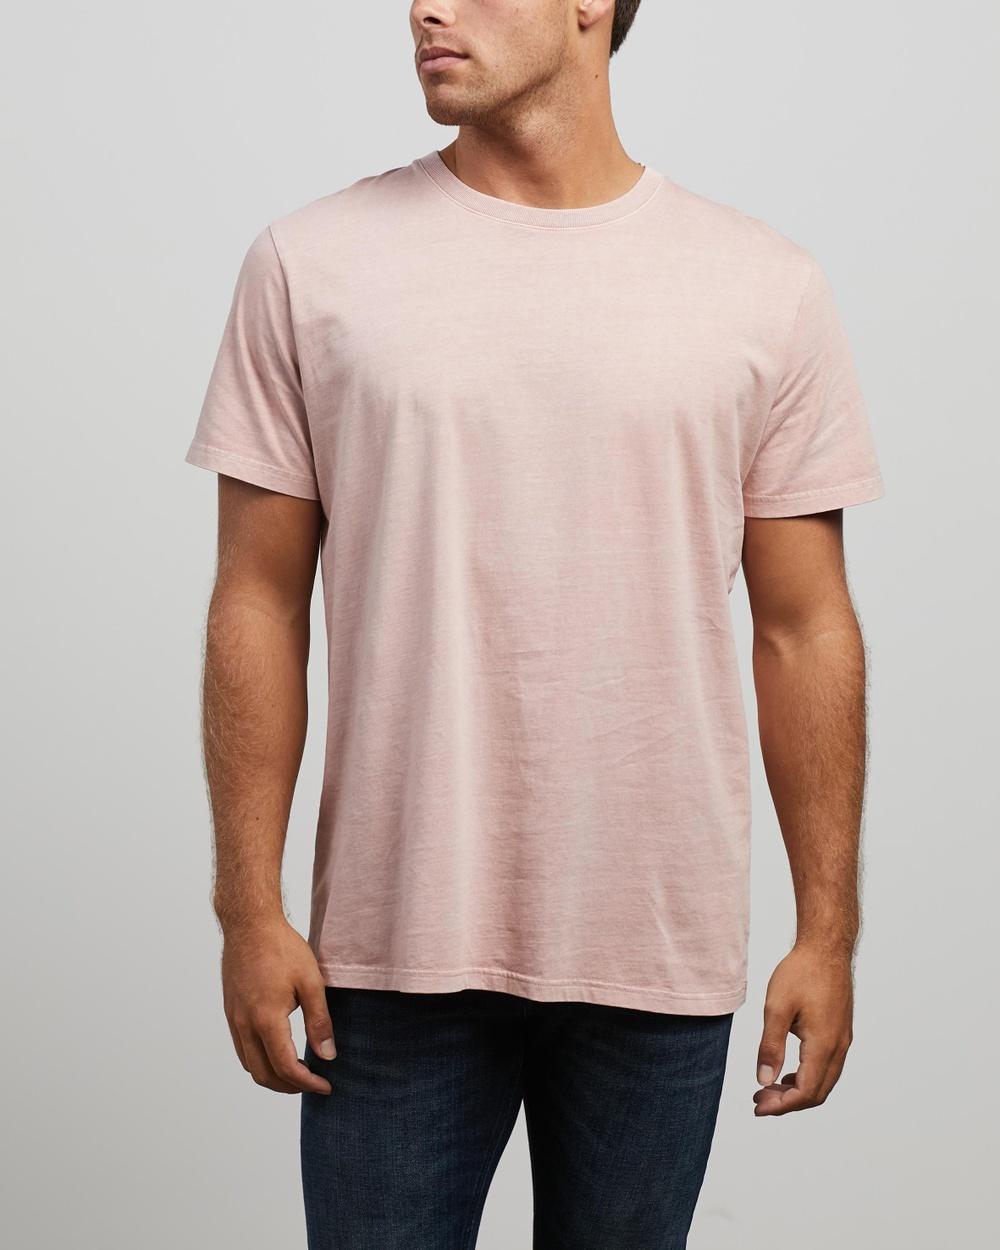 Neuw - Band Tee - T-Shirts & Singlets (Peach) Band Tee